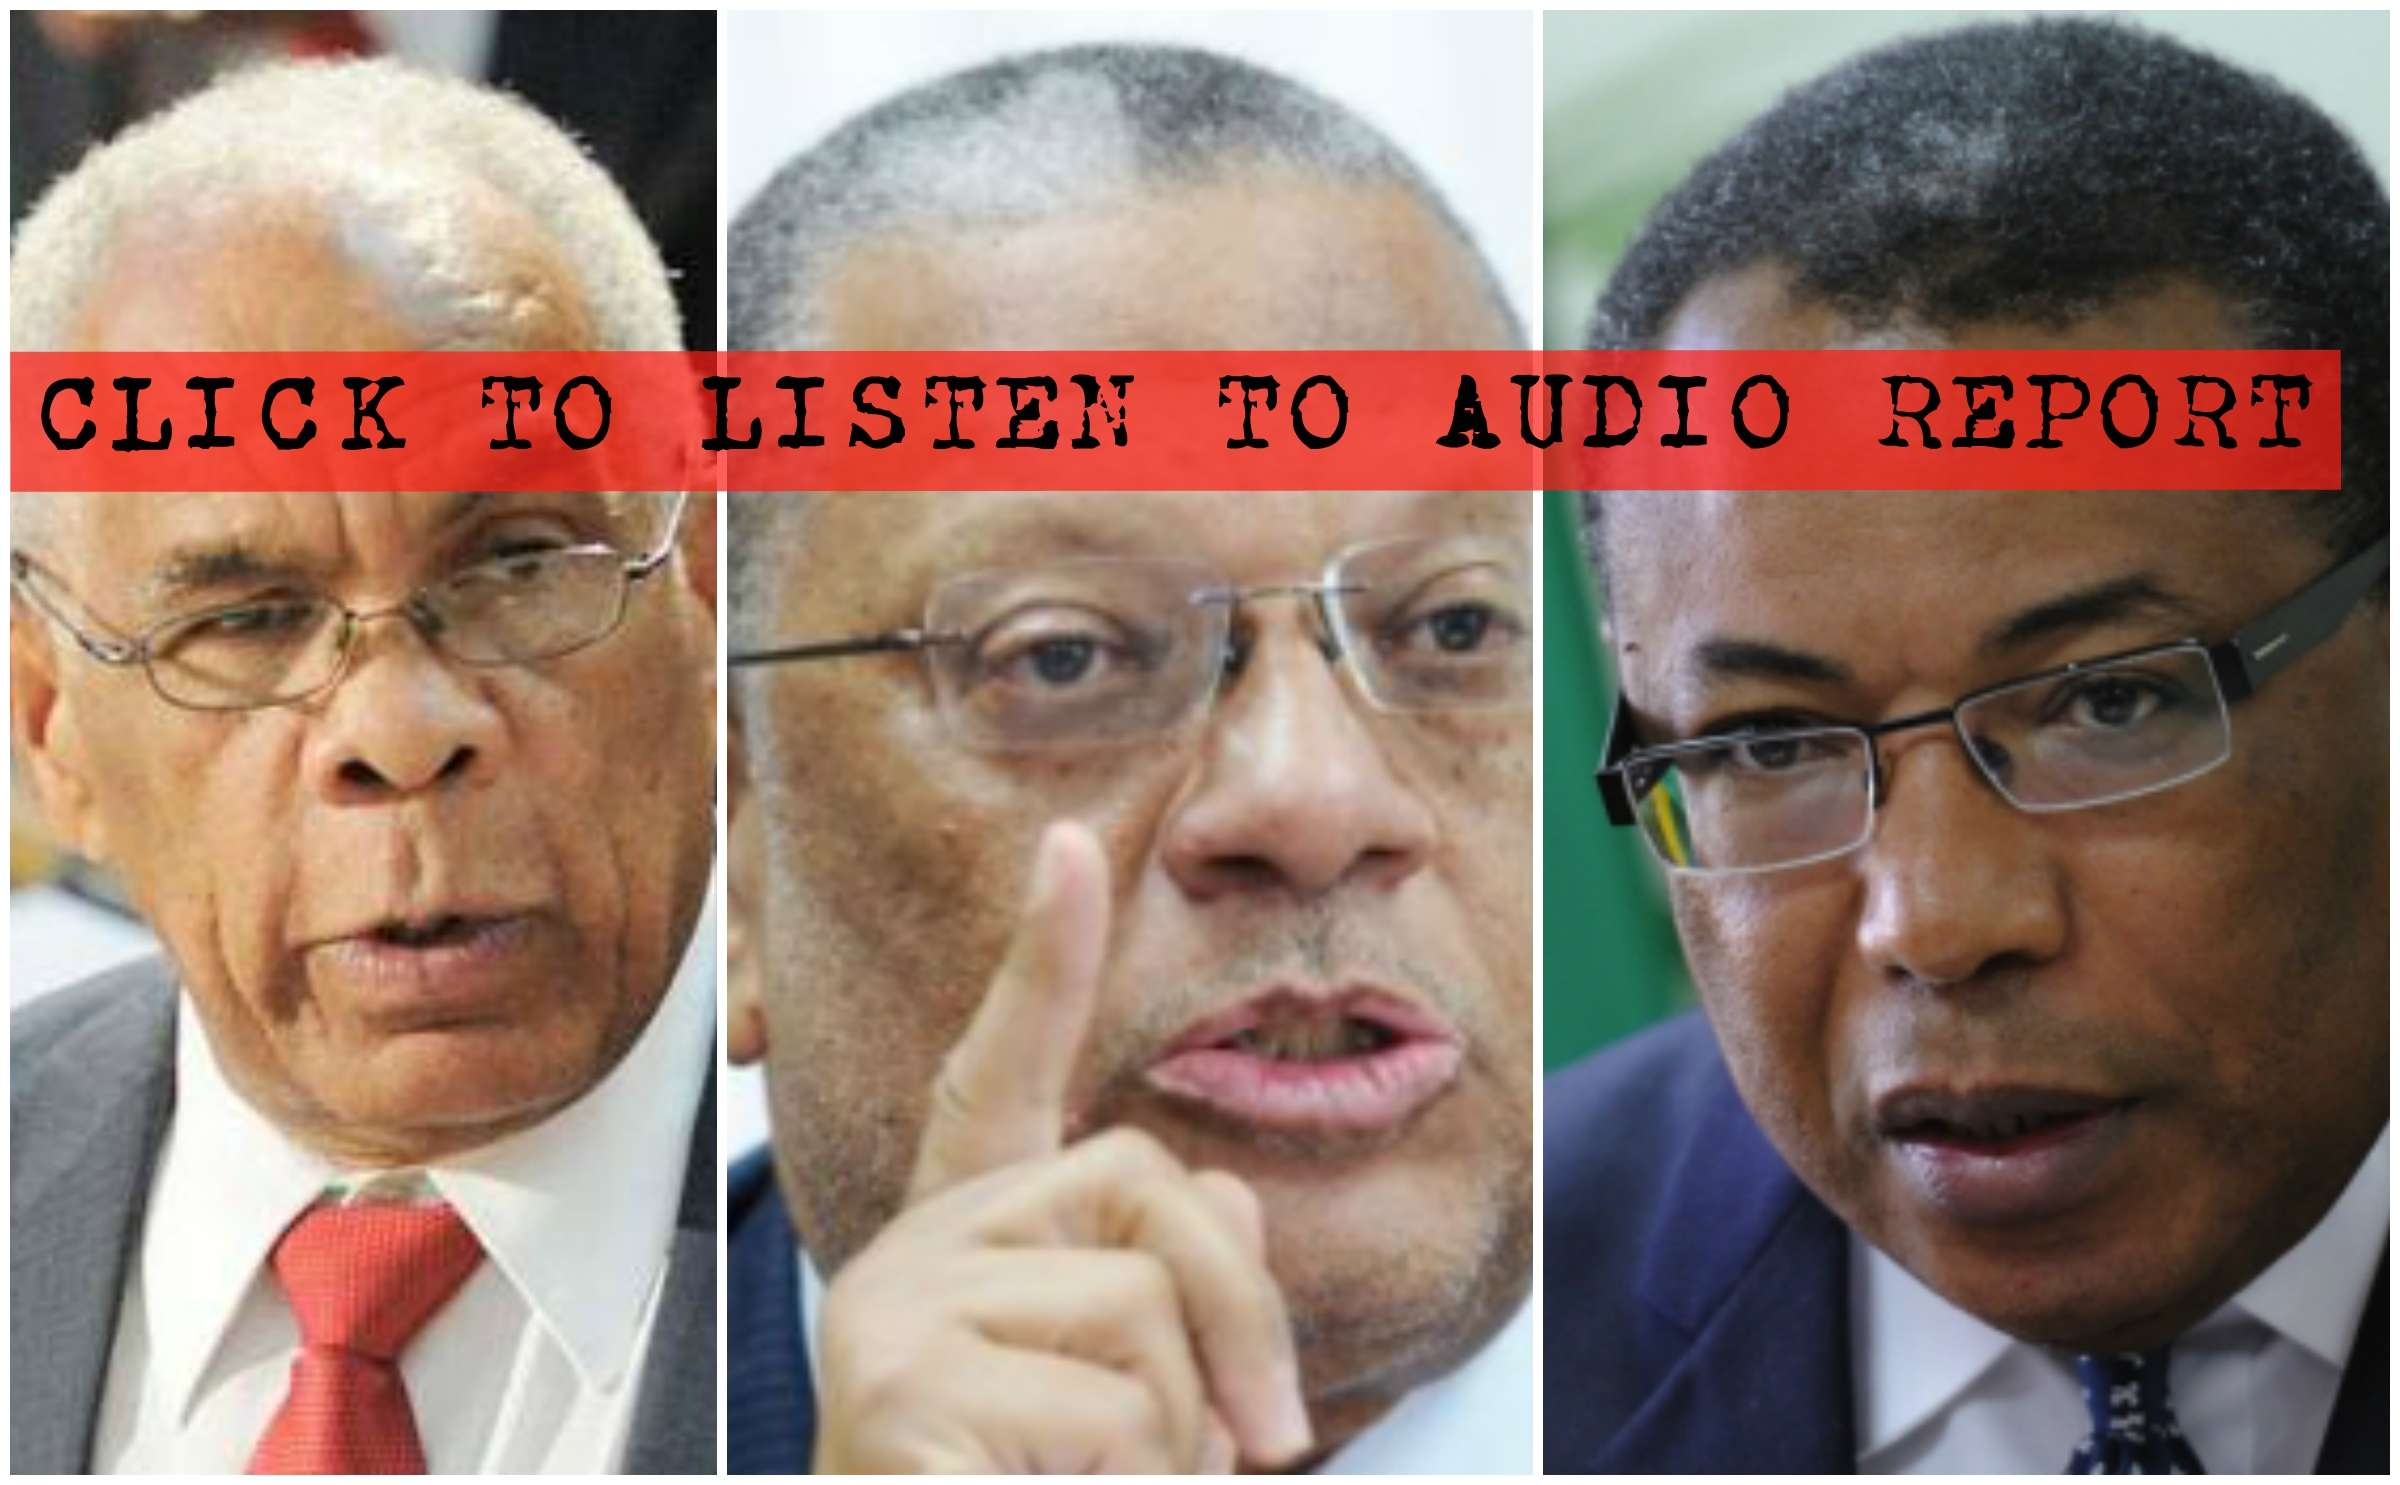 Phillips, Davies, Hylton Divided on Krauck, Anchor Finance Investment Offer – AUDIO